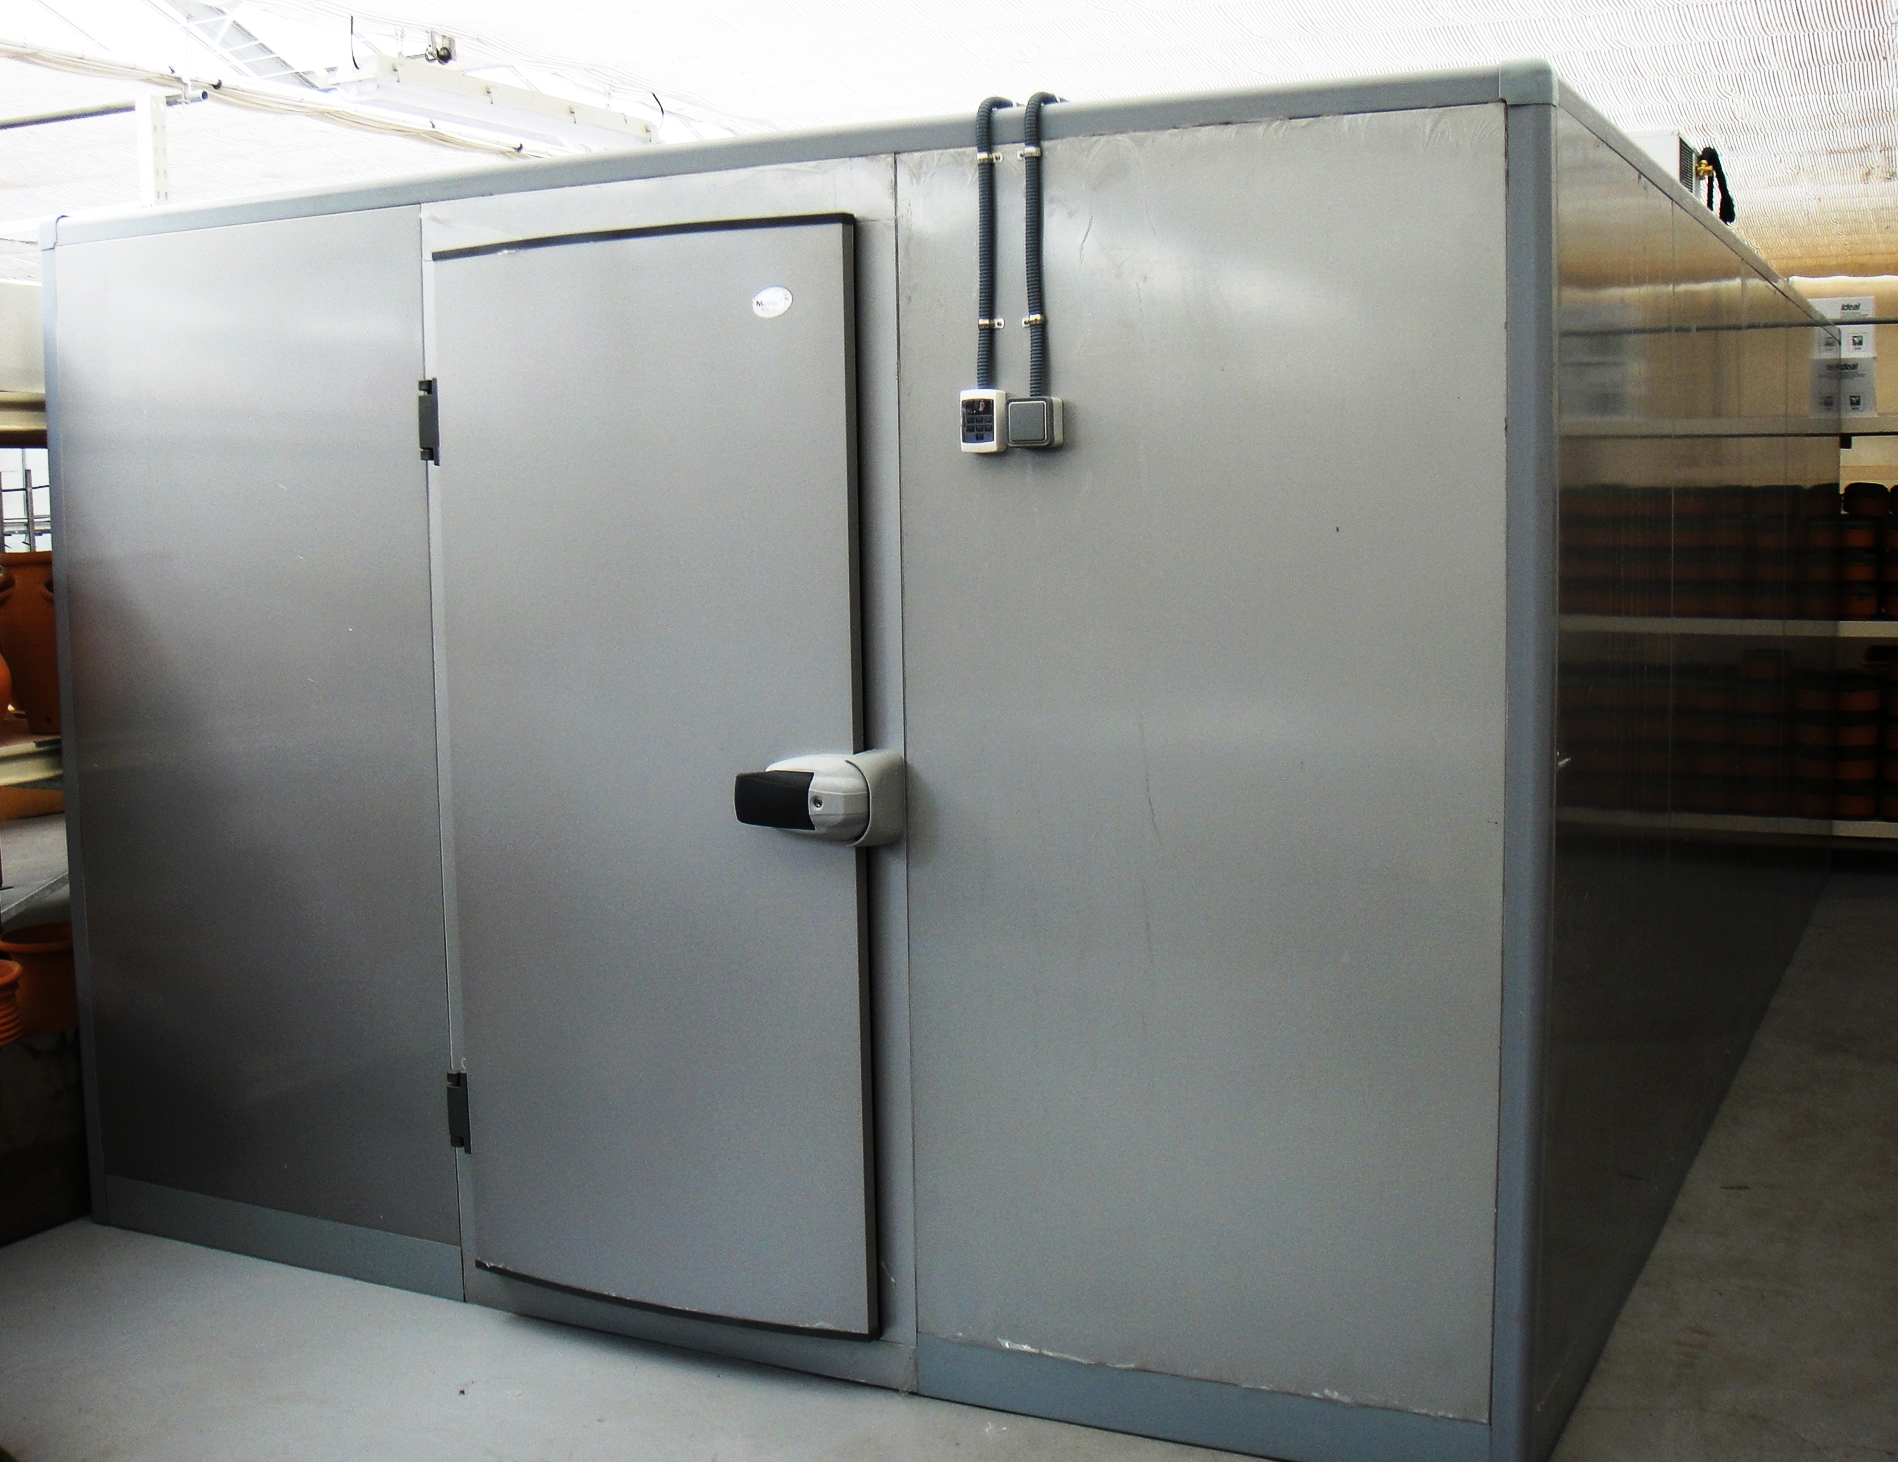 Camara frigorifica segunda mano 【PIDE PRESUPUESTO ... - photo#32